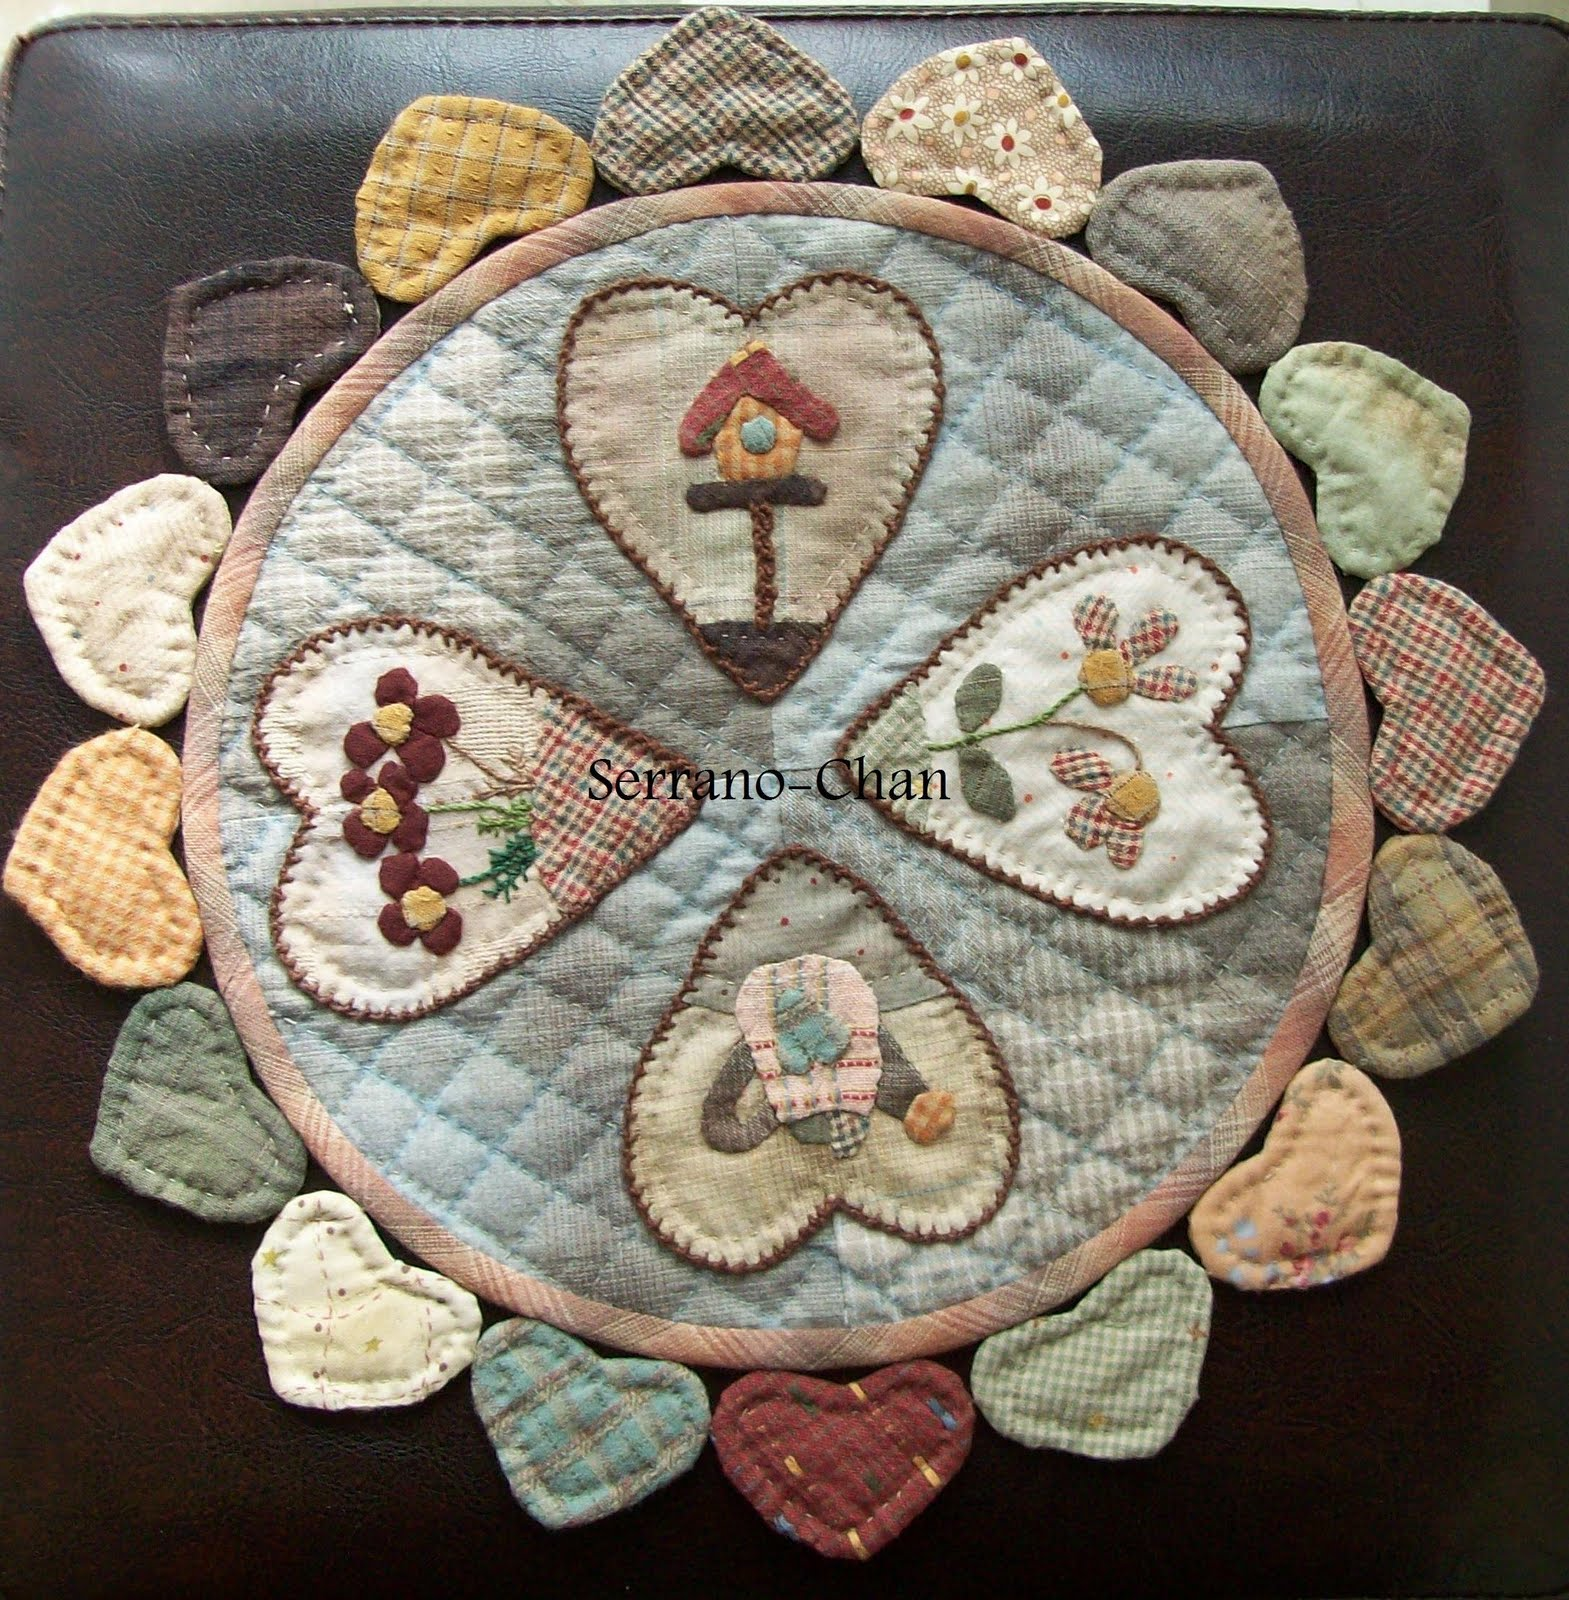 Reiko kato on pinterest sunbonnet sue quilts and folk style - Reiko kato patchwork ...